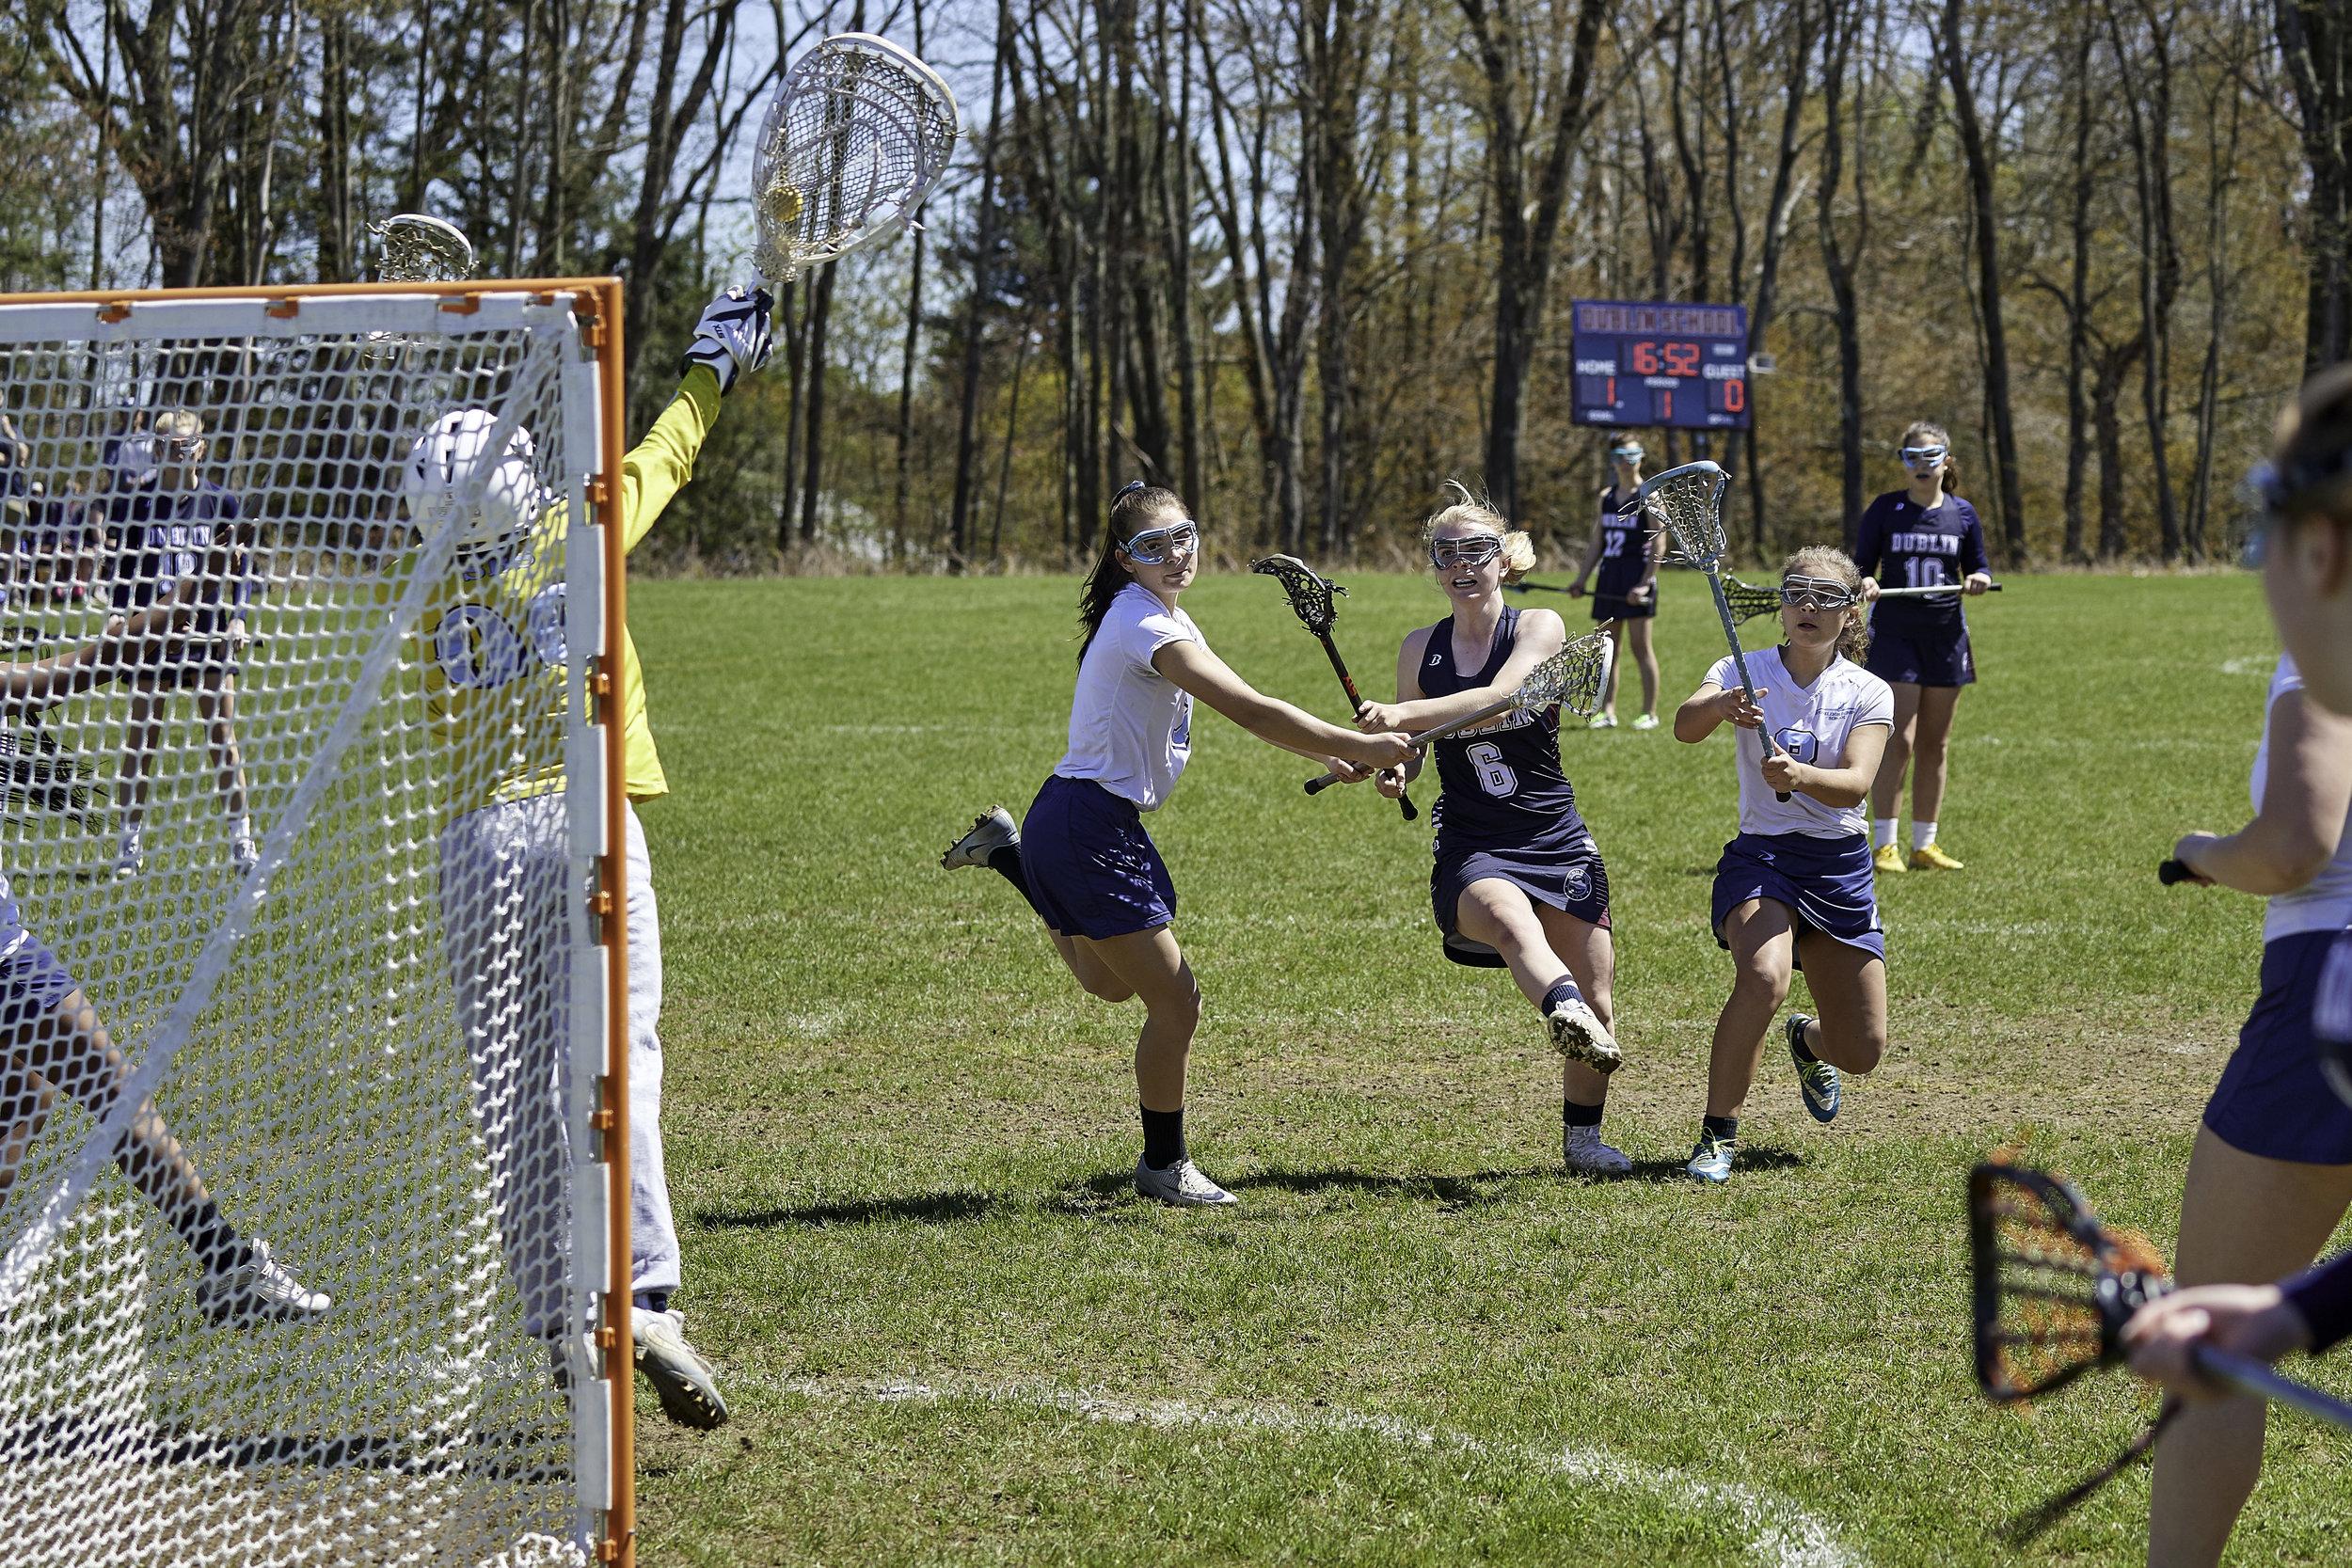 Girls Lacrosse vs. Stoneleigh Burnham School - May 11, 2019 - May 10, 2019193145.jpg